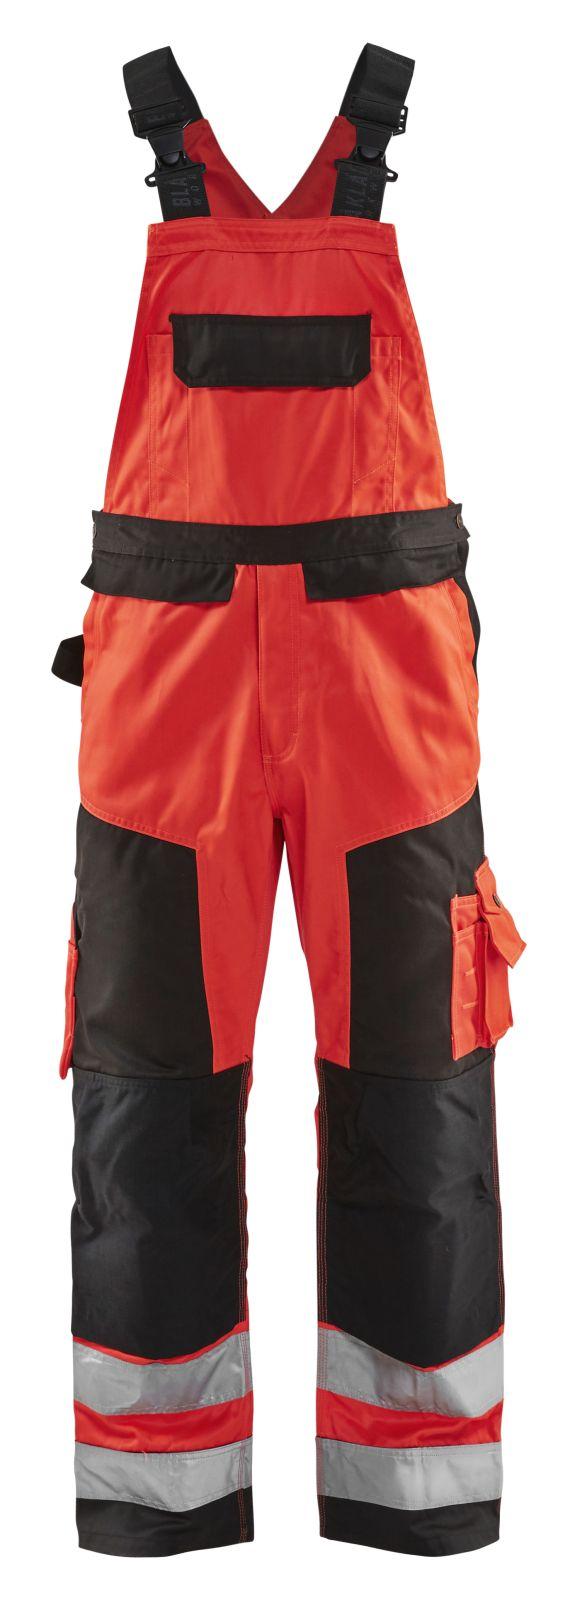 Blaklader Amerikaanse overalls 26601804 High Vis fluor rood-zwart(5599)